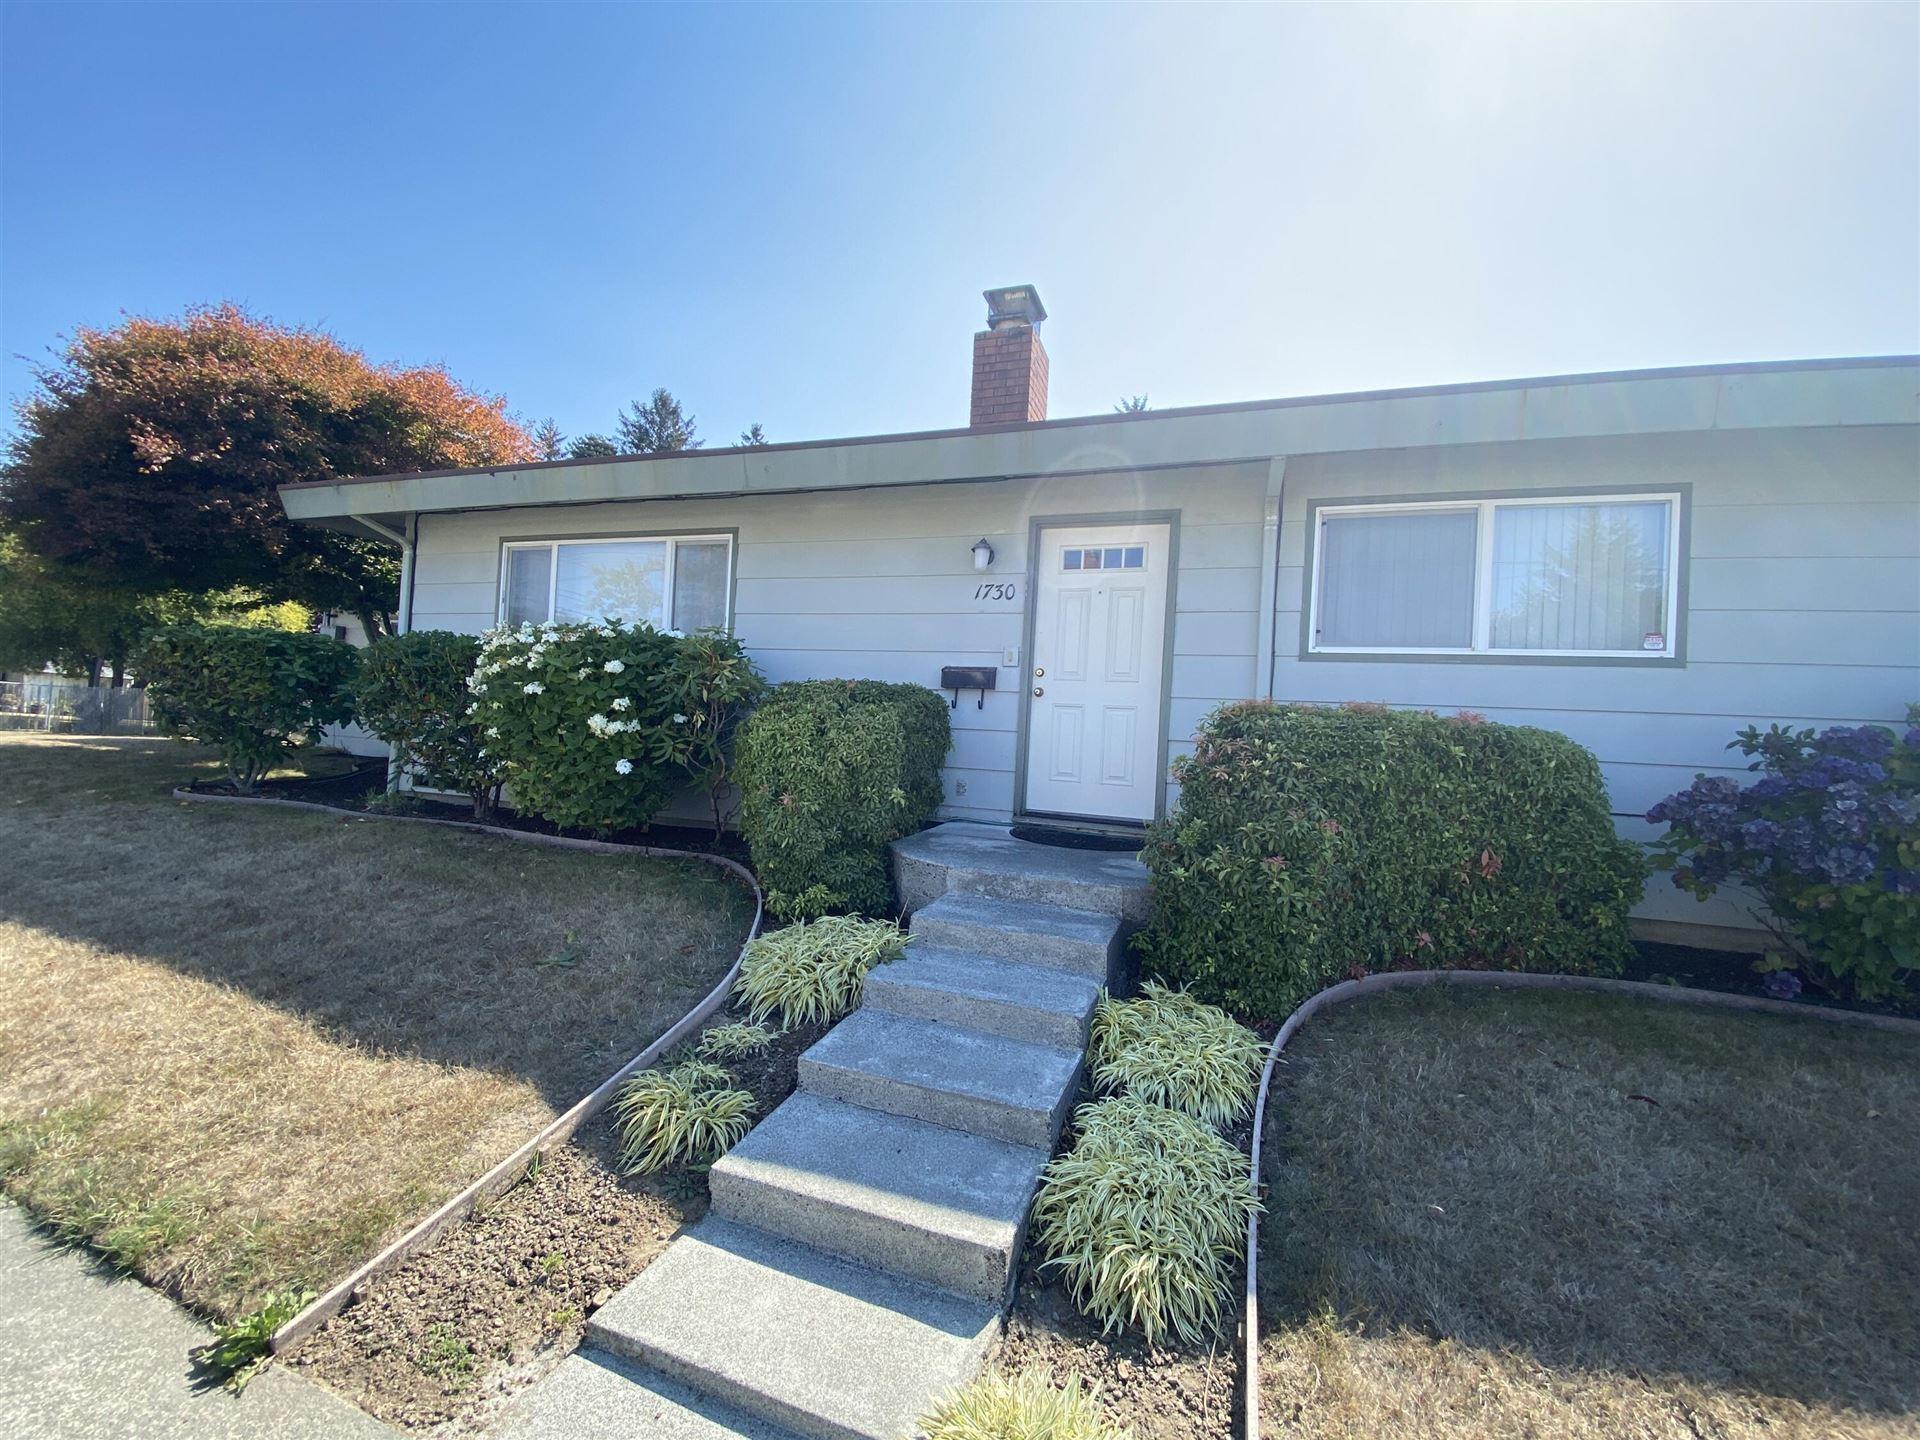 1730 Hodgson Street, Eureka, CA 95503 - MLS#: 260141